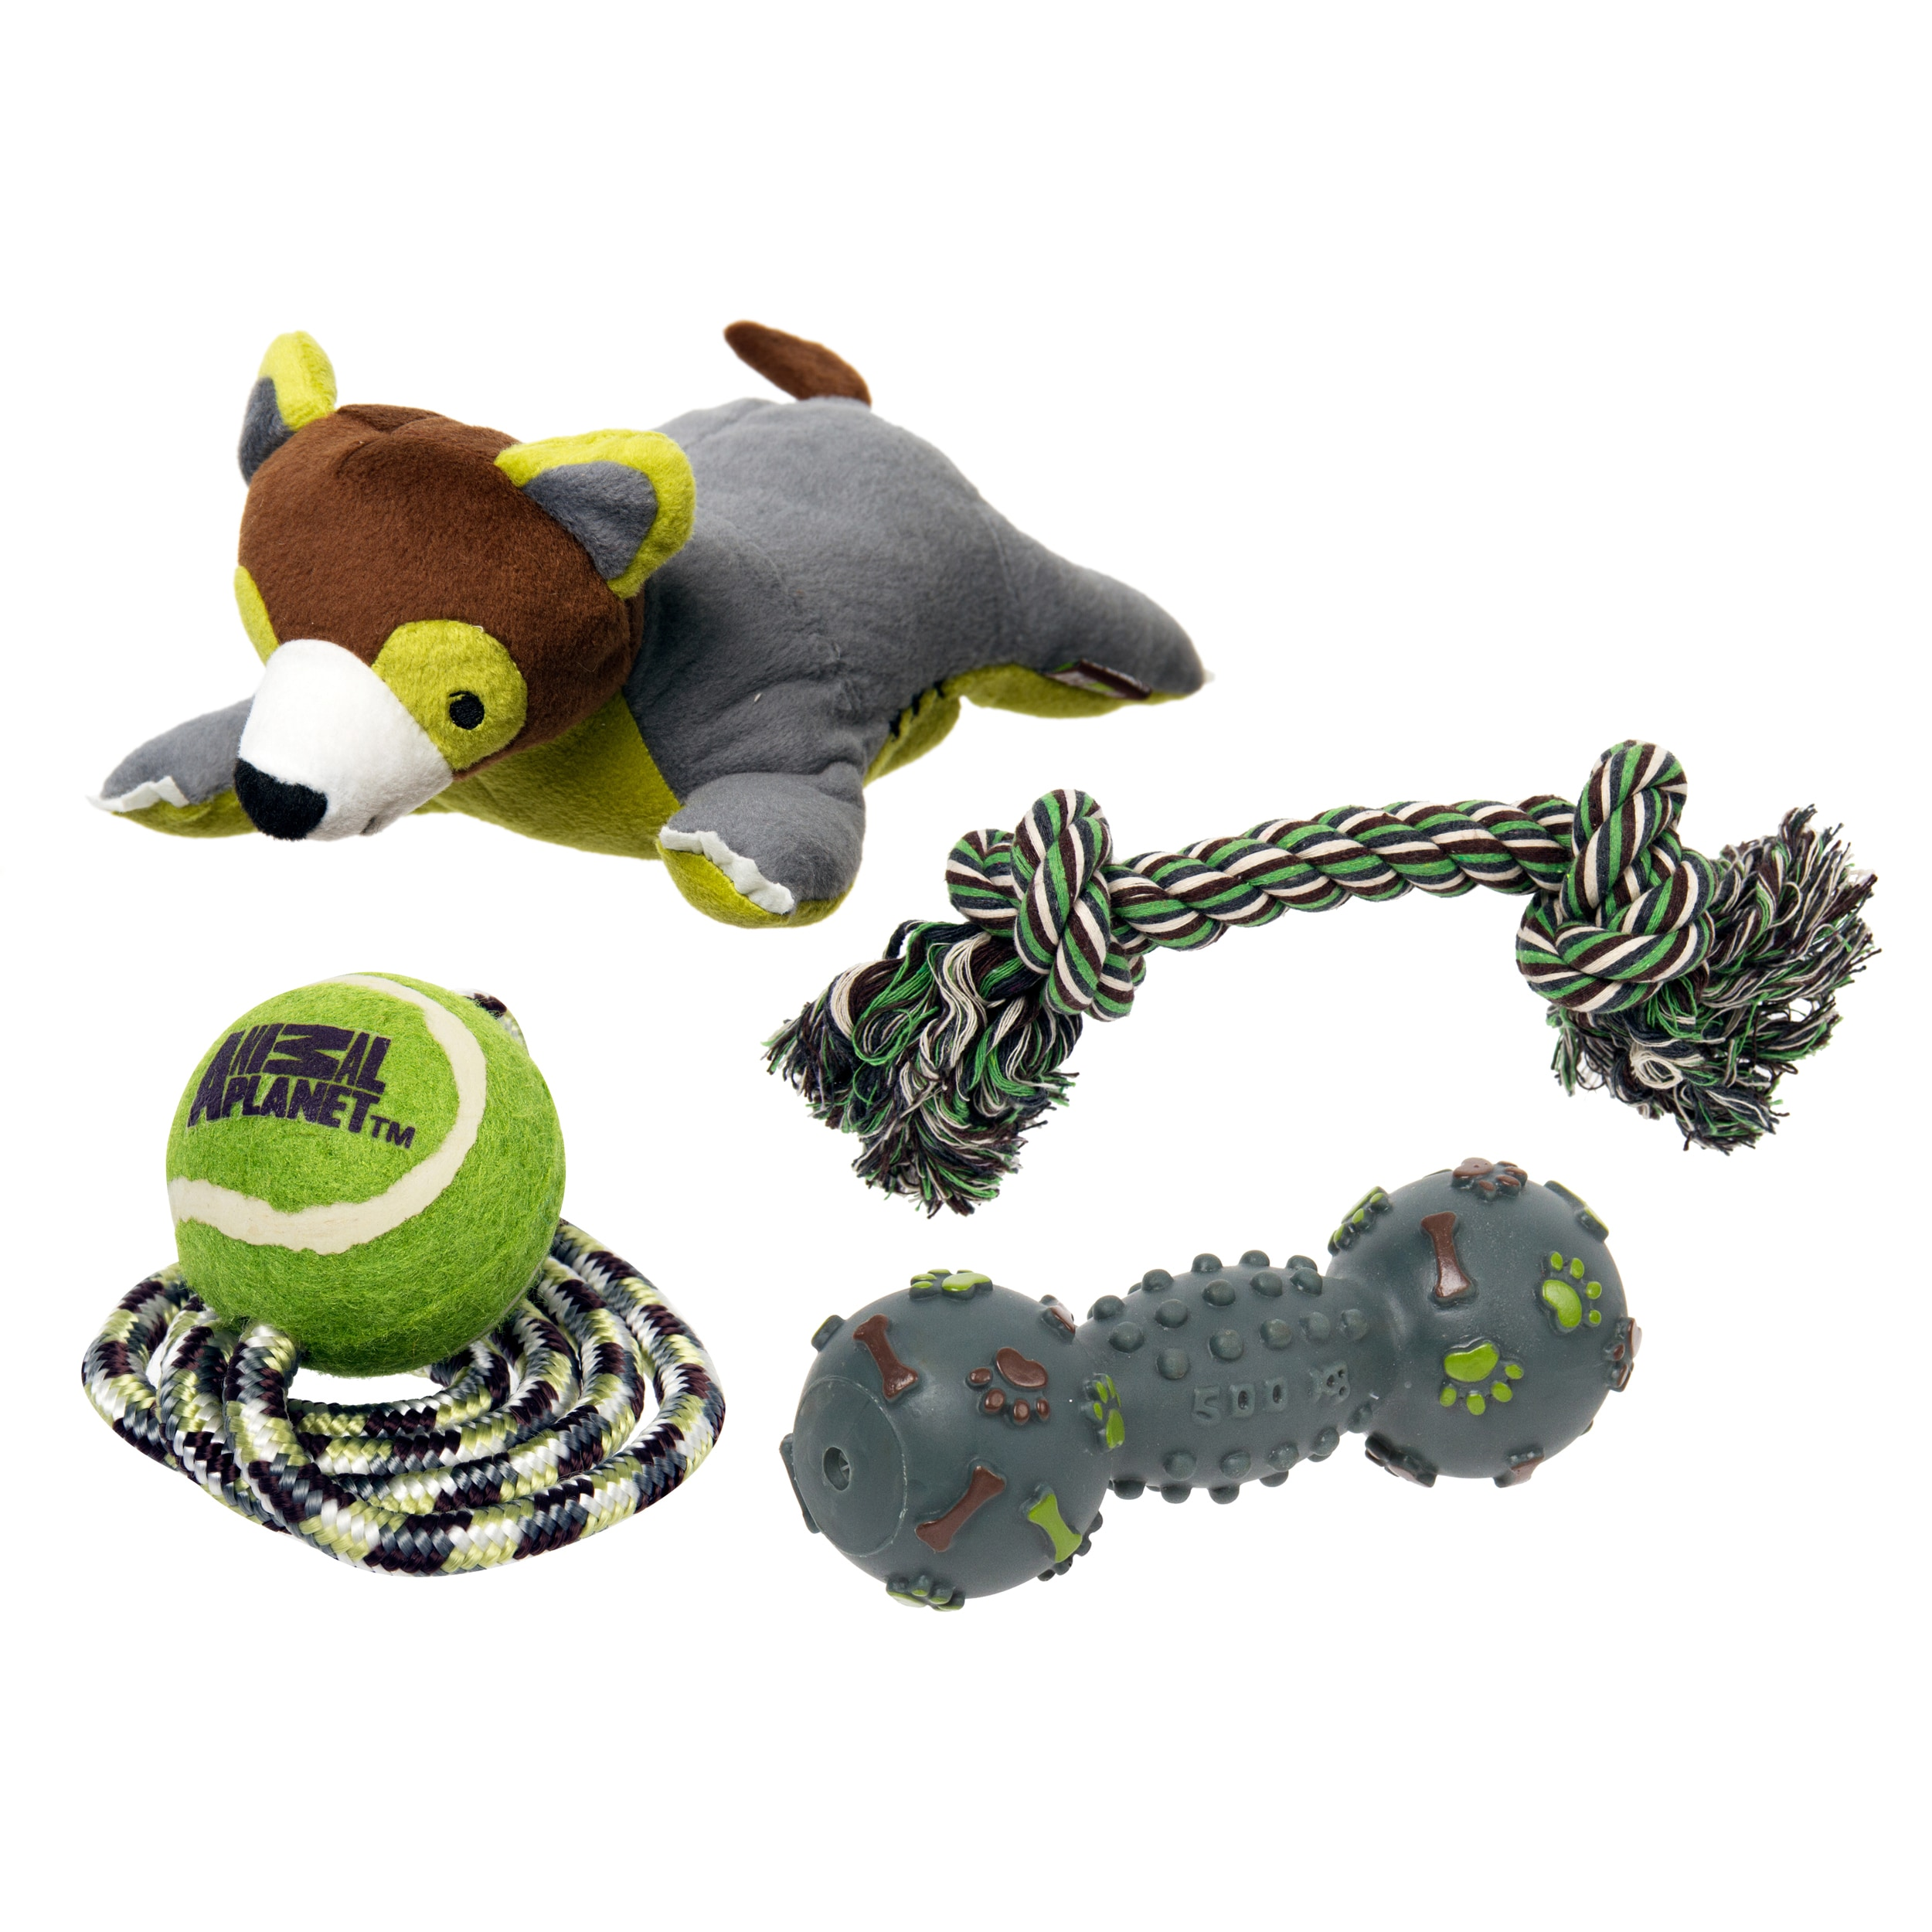 Animal-Planet-Plush-Toy-4-pack-e9175a11-c8d7-40e0-b669-8eea9977ca5e.jpg